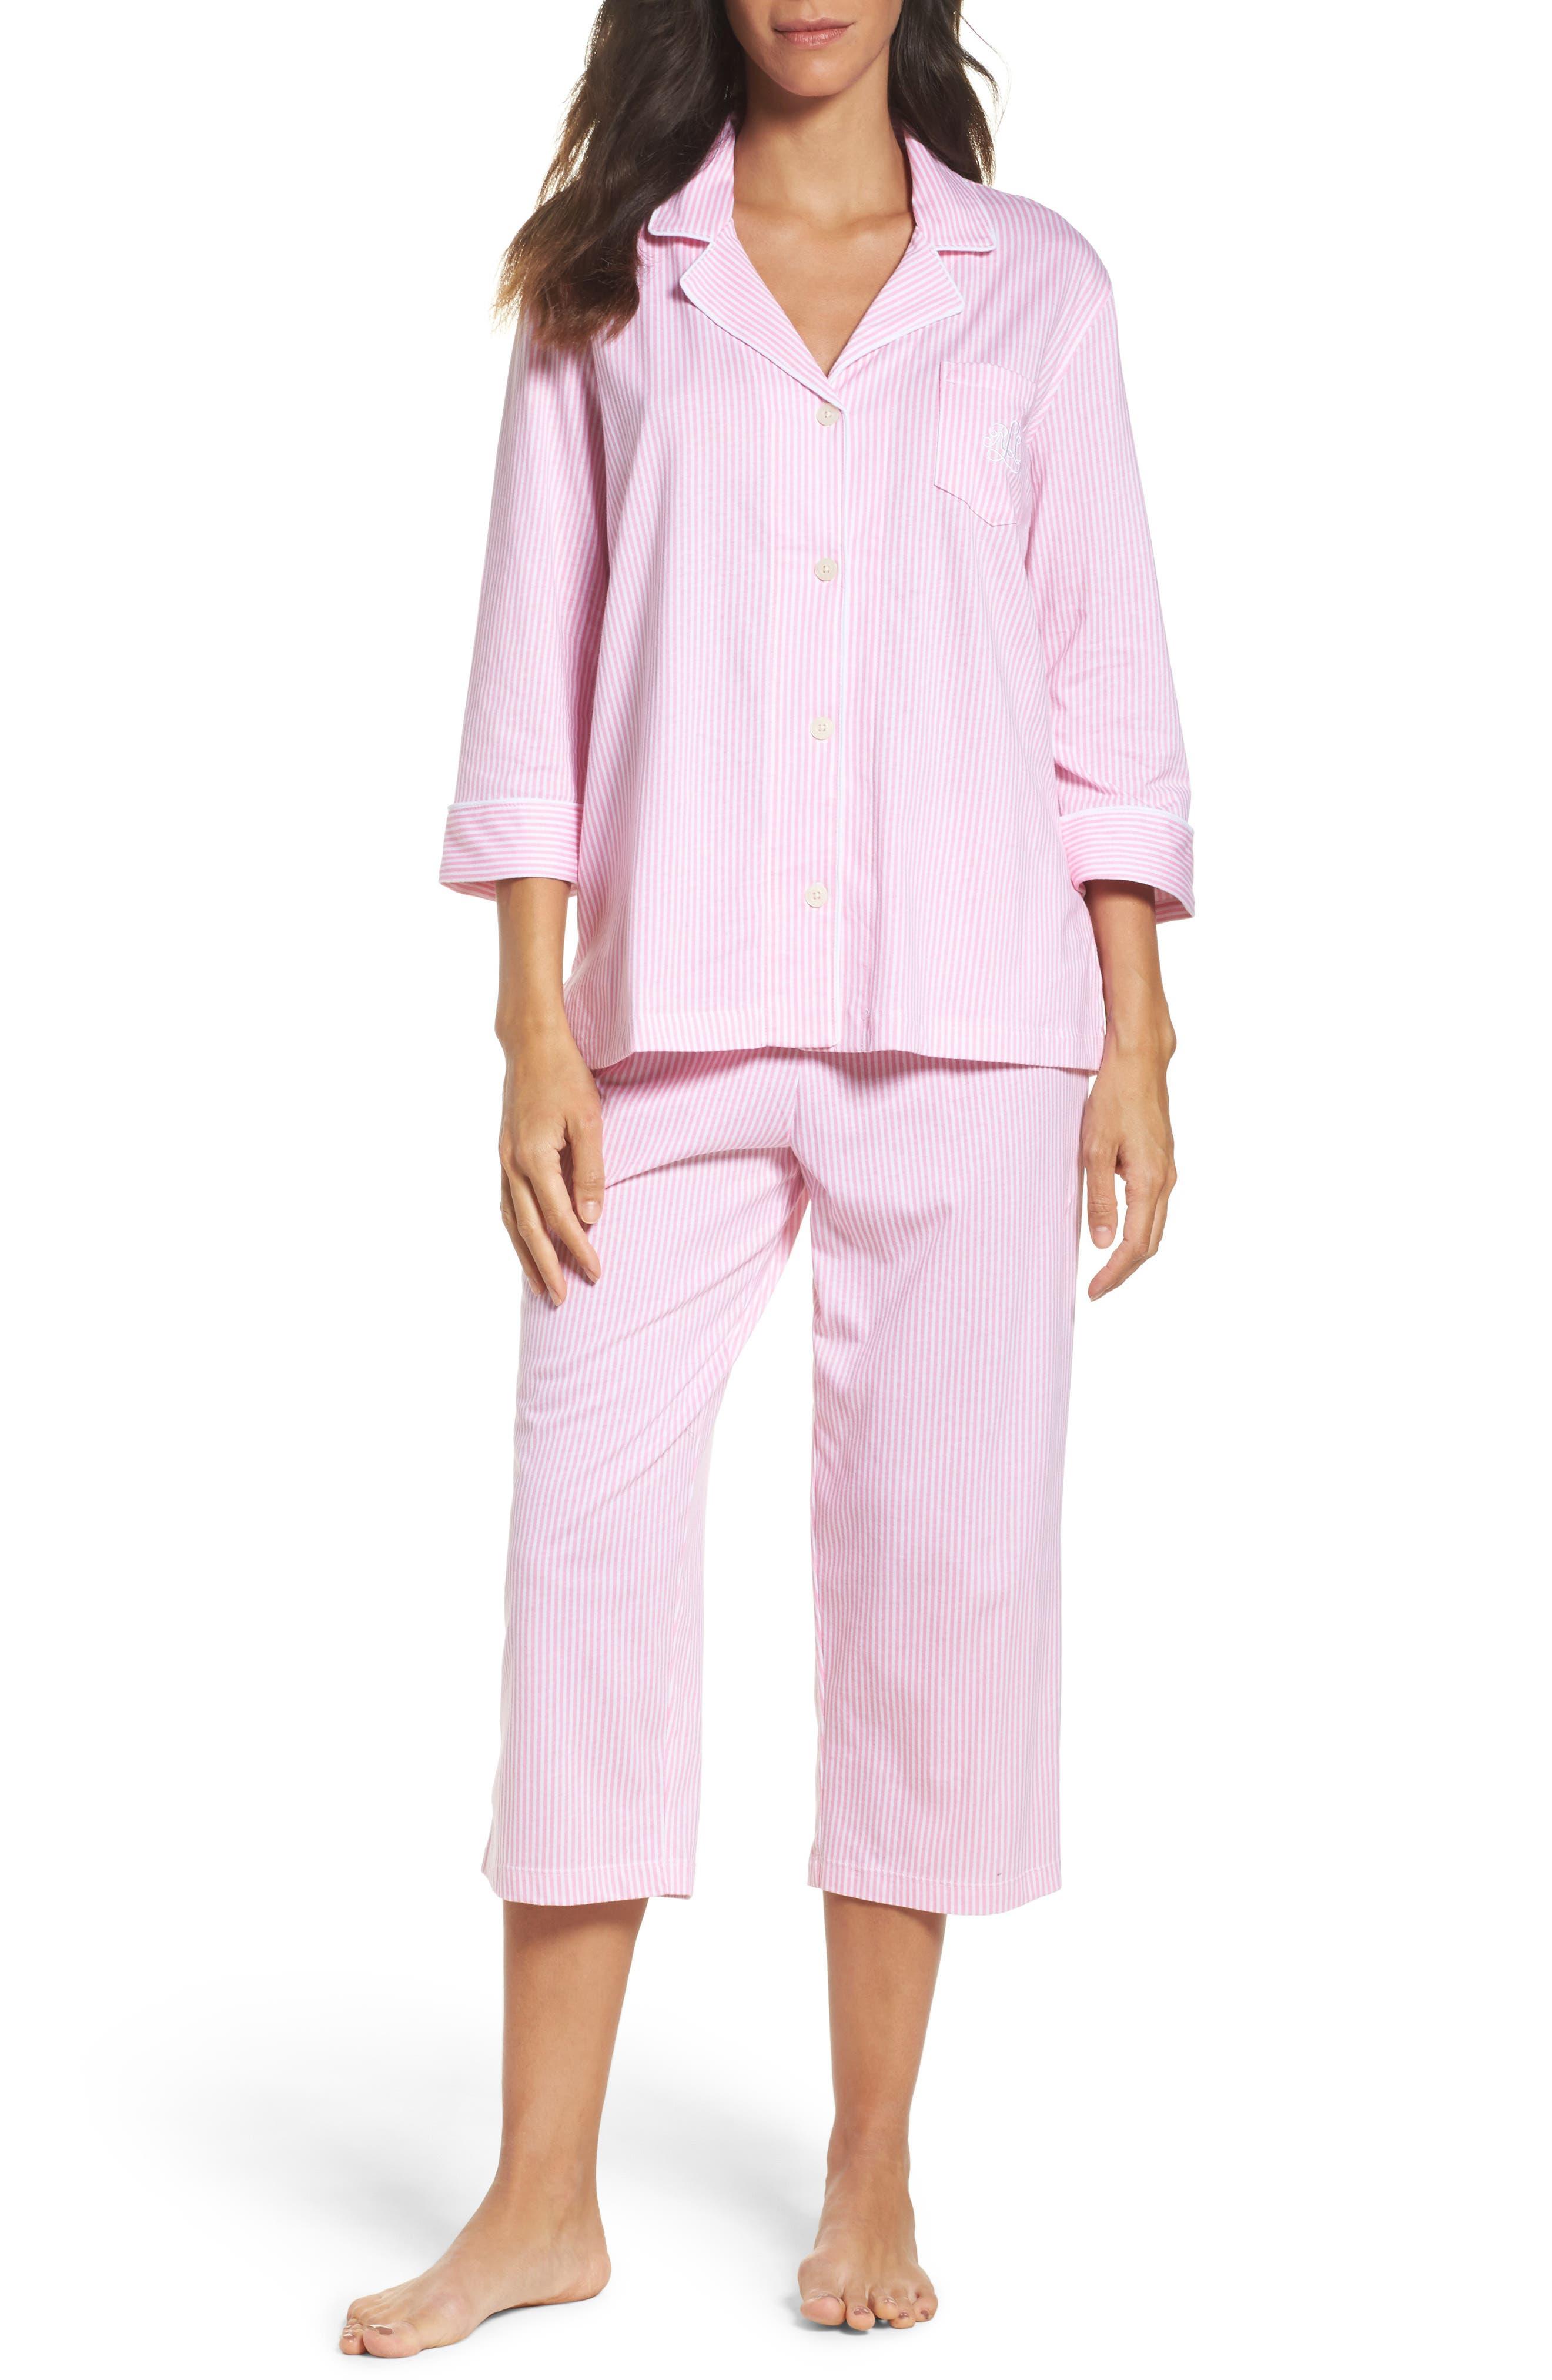 Knit Crop Pajamas,                             Main thumbnail 1, color,                             Lagoon Pink/ White Stripe